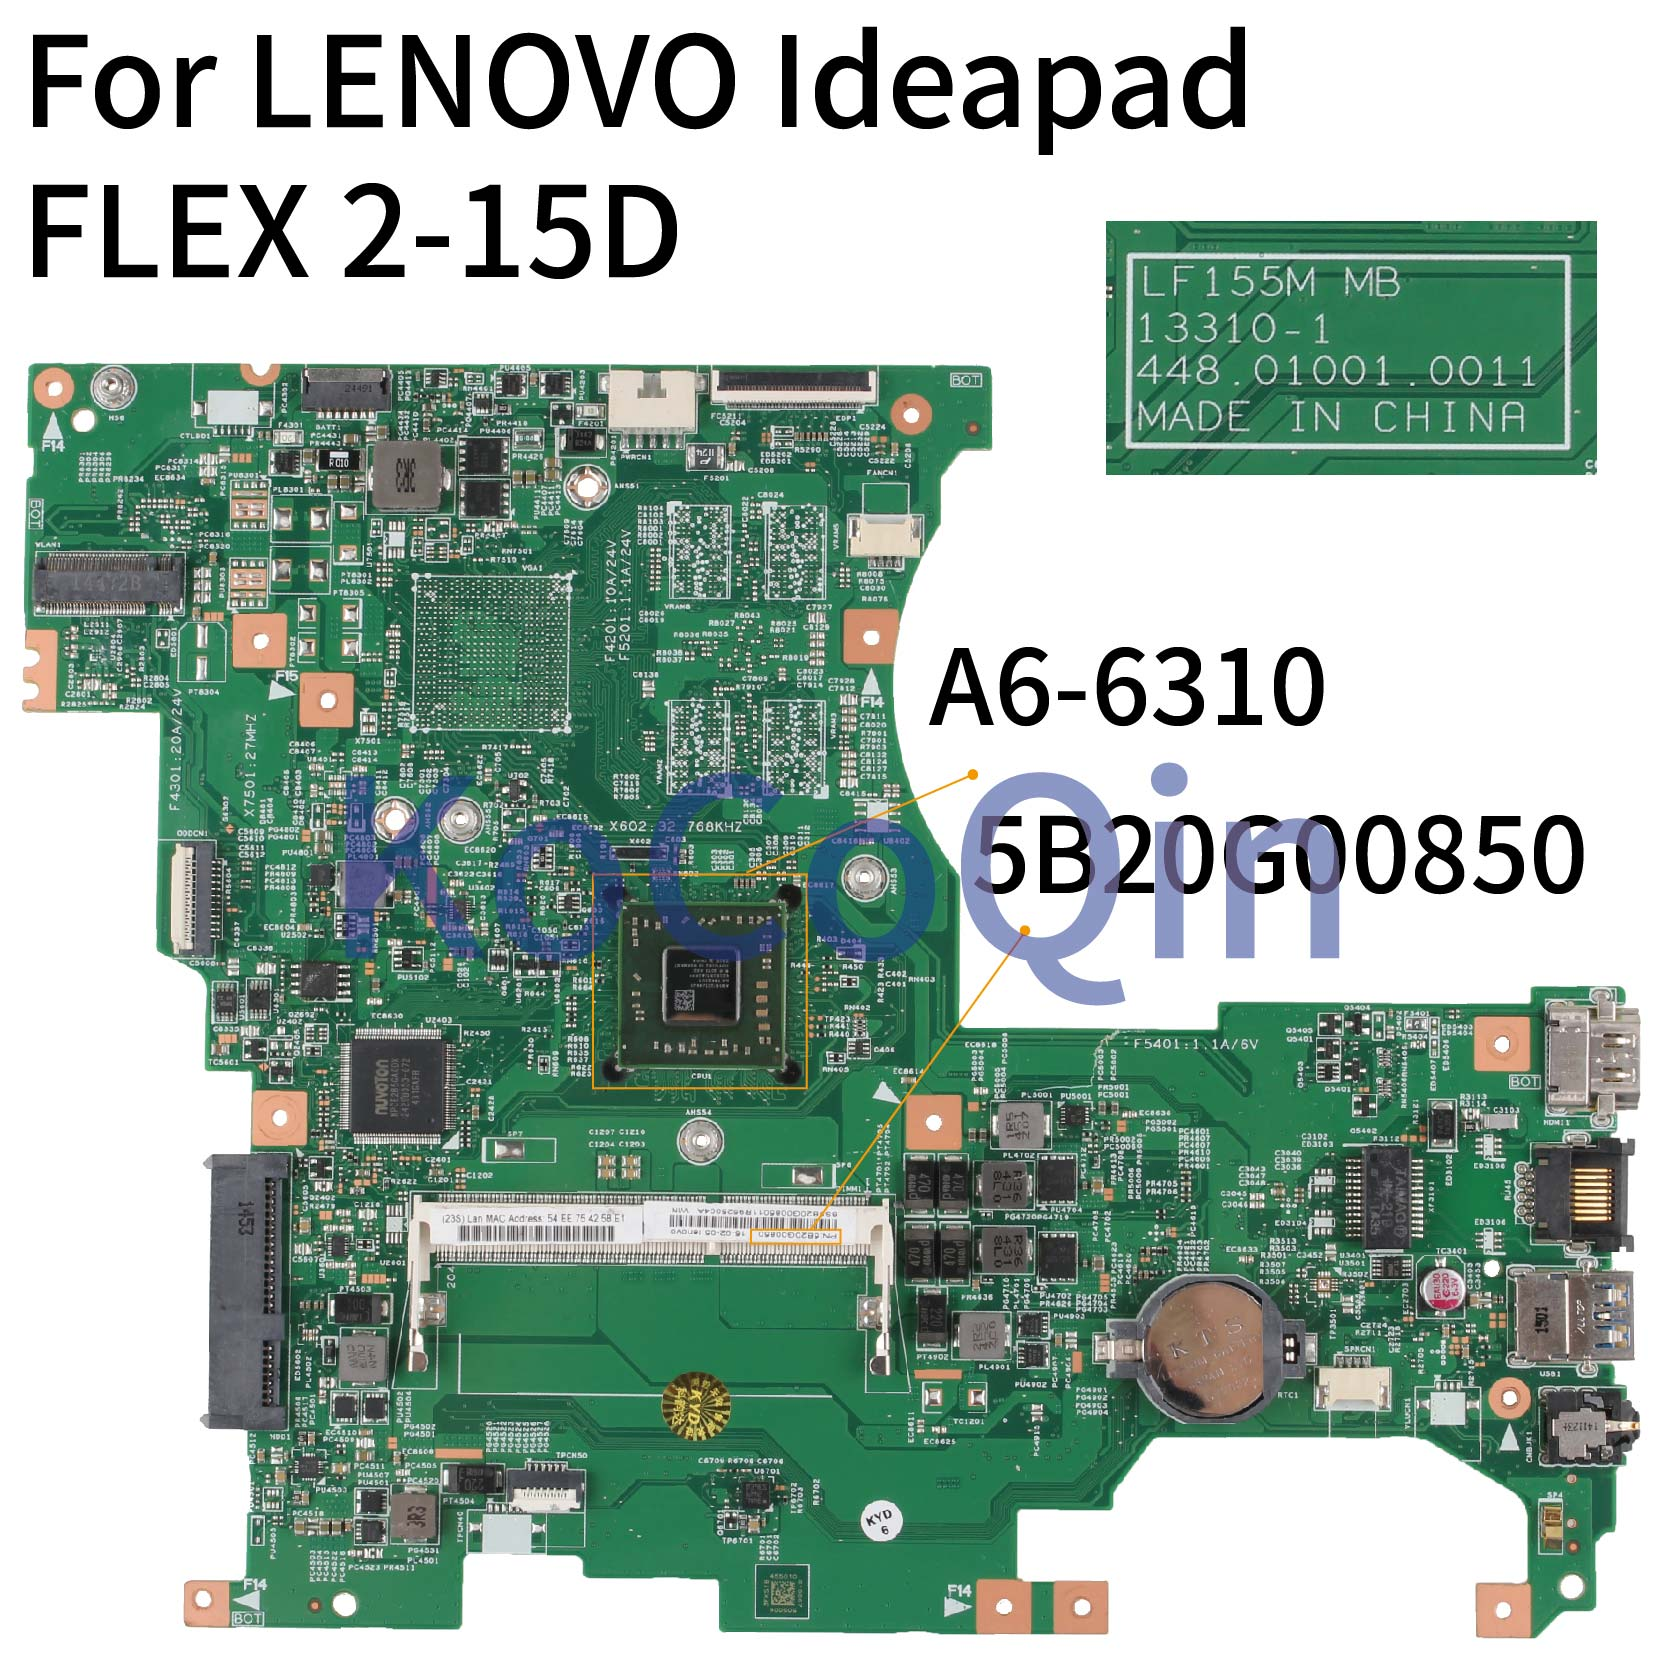 KoCoQin Laptop Motherboard For LENOVO Ideapad FLEX 2-15D A6-6310 Mainboard 5B20G00850 13310-1 448.01001.0011